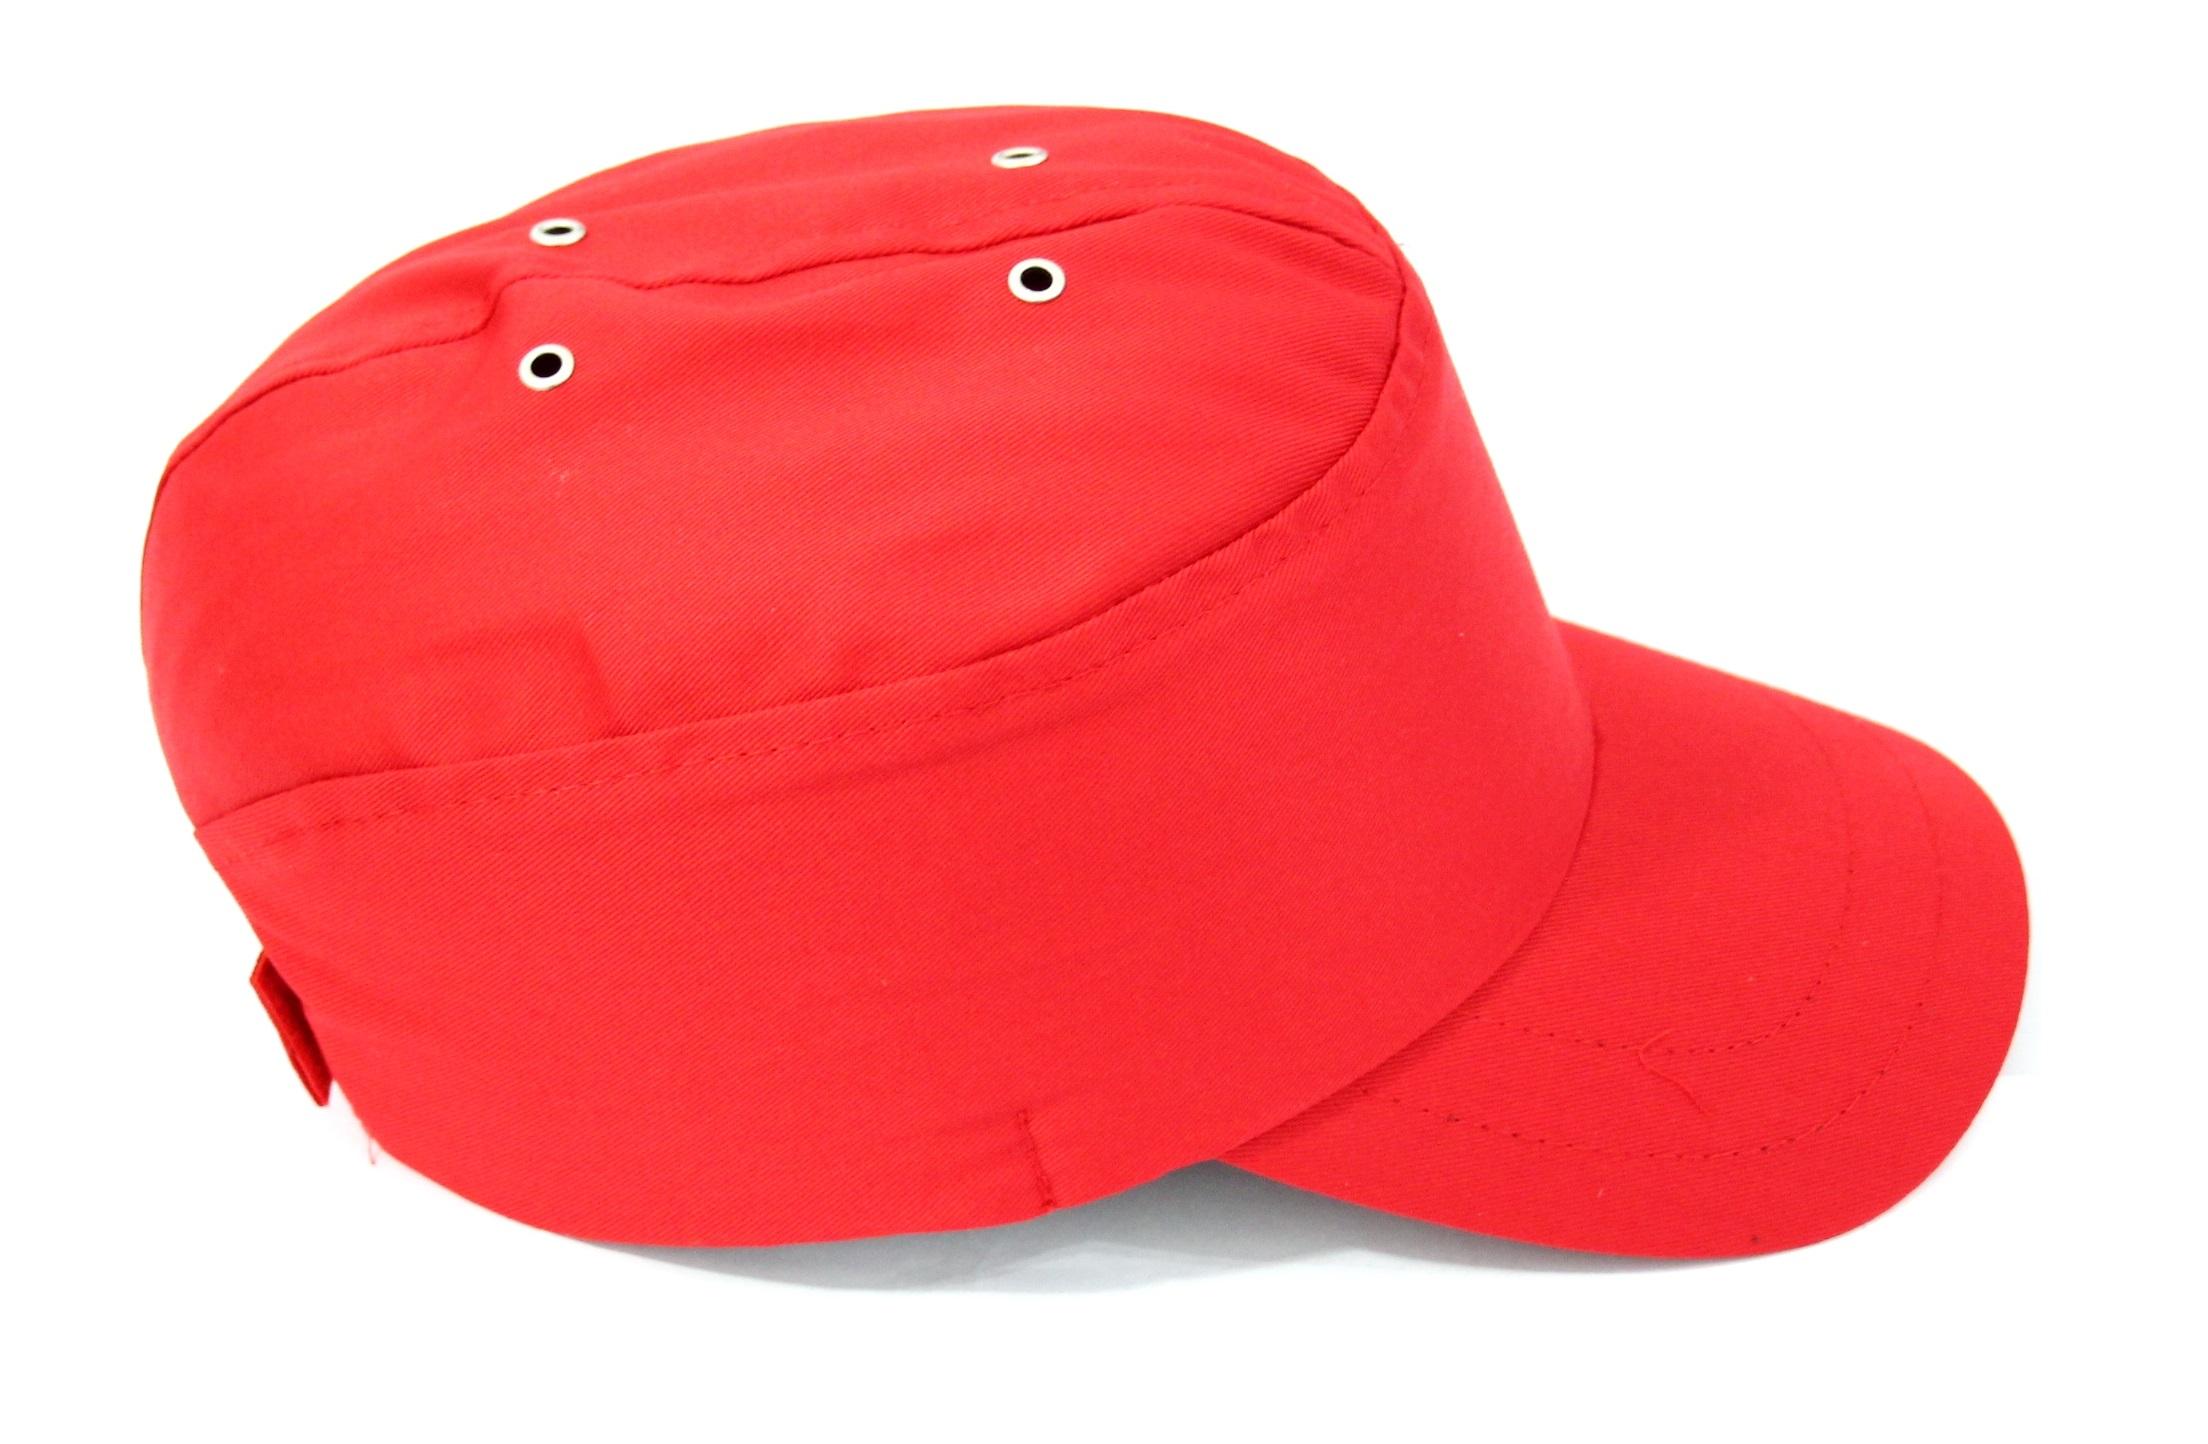 Каскетка AmparoКаски, шлемы<br>Материал: полиэтилен,<br>Цвет: красная<br>